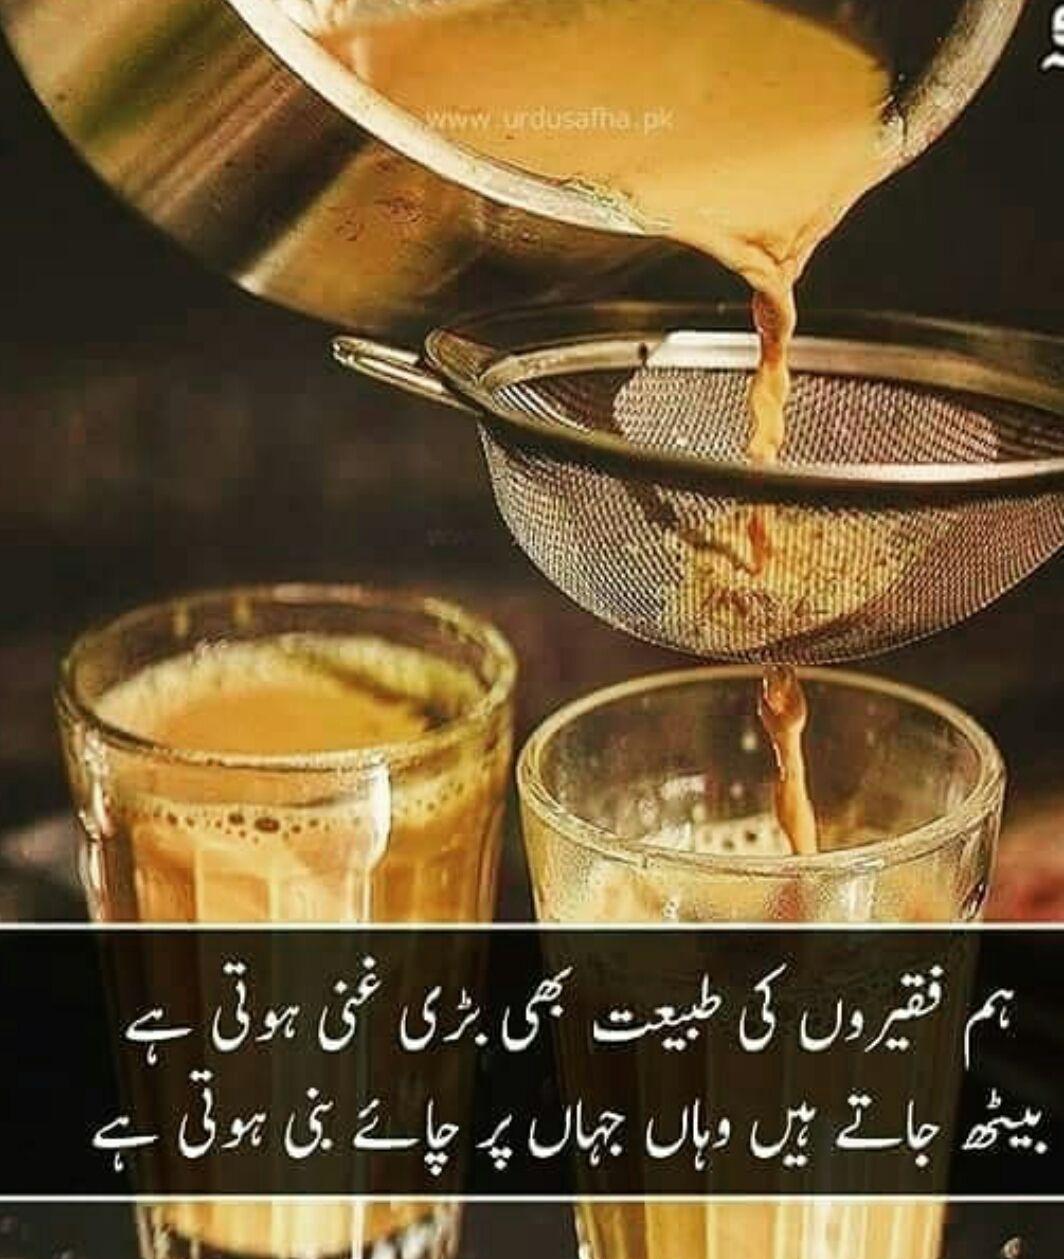 Pin By Meri Zindagi On Pehli Barish Ki Dua Urdu Funny Poetry Tea Lover Quotes Funny Quotes In Urdu